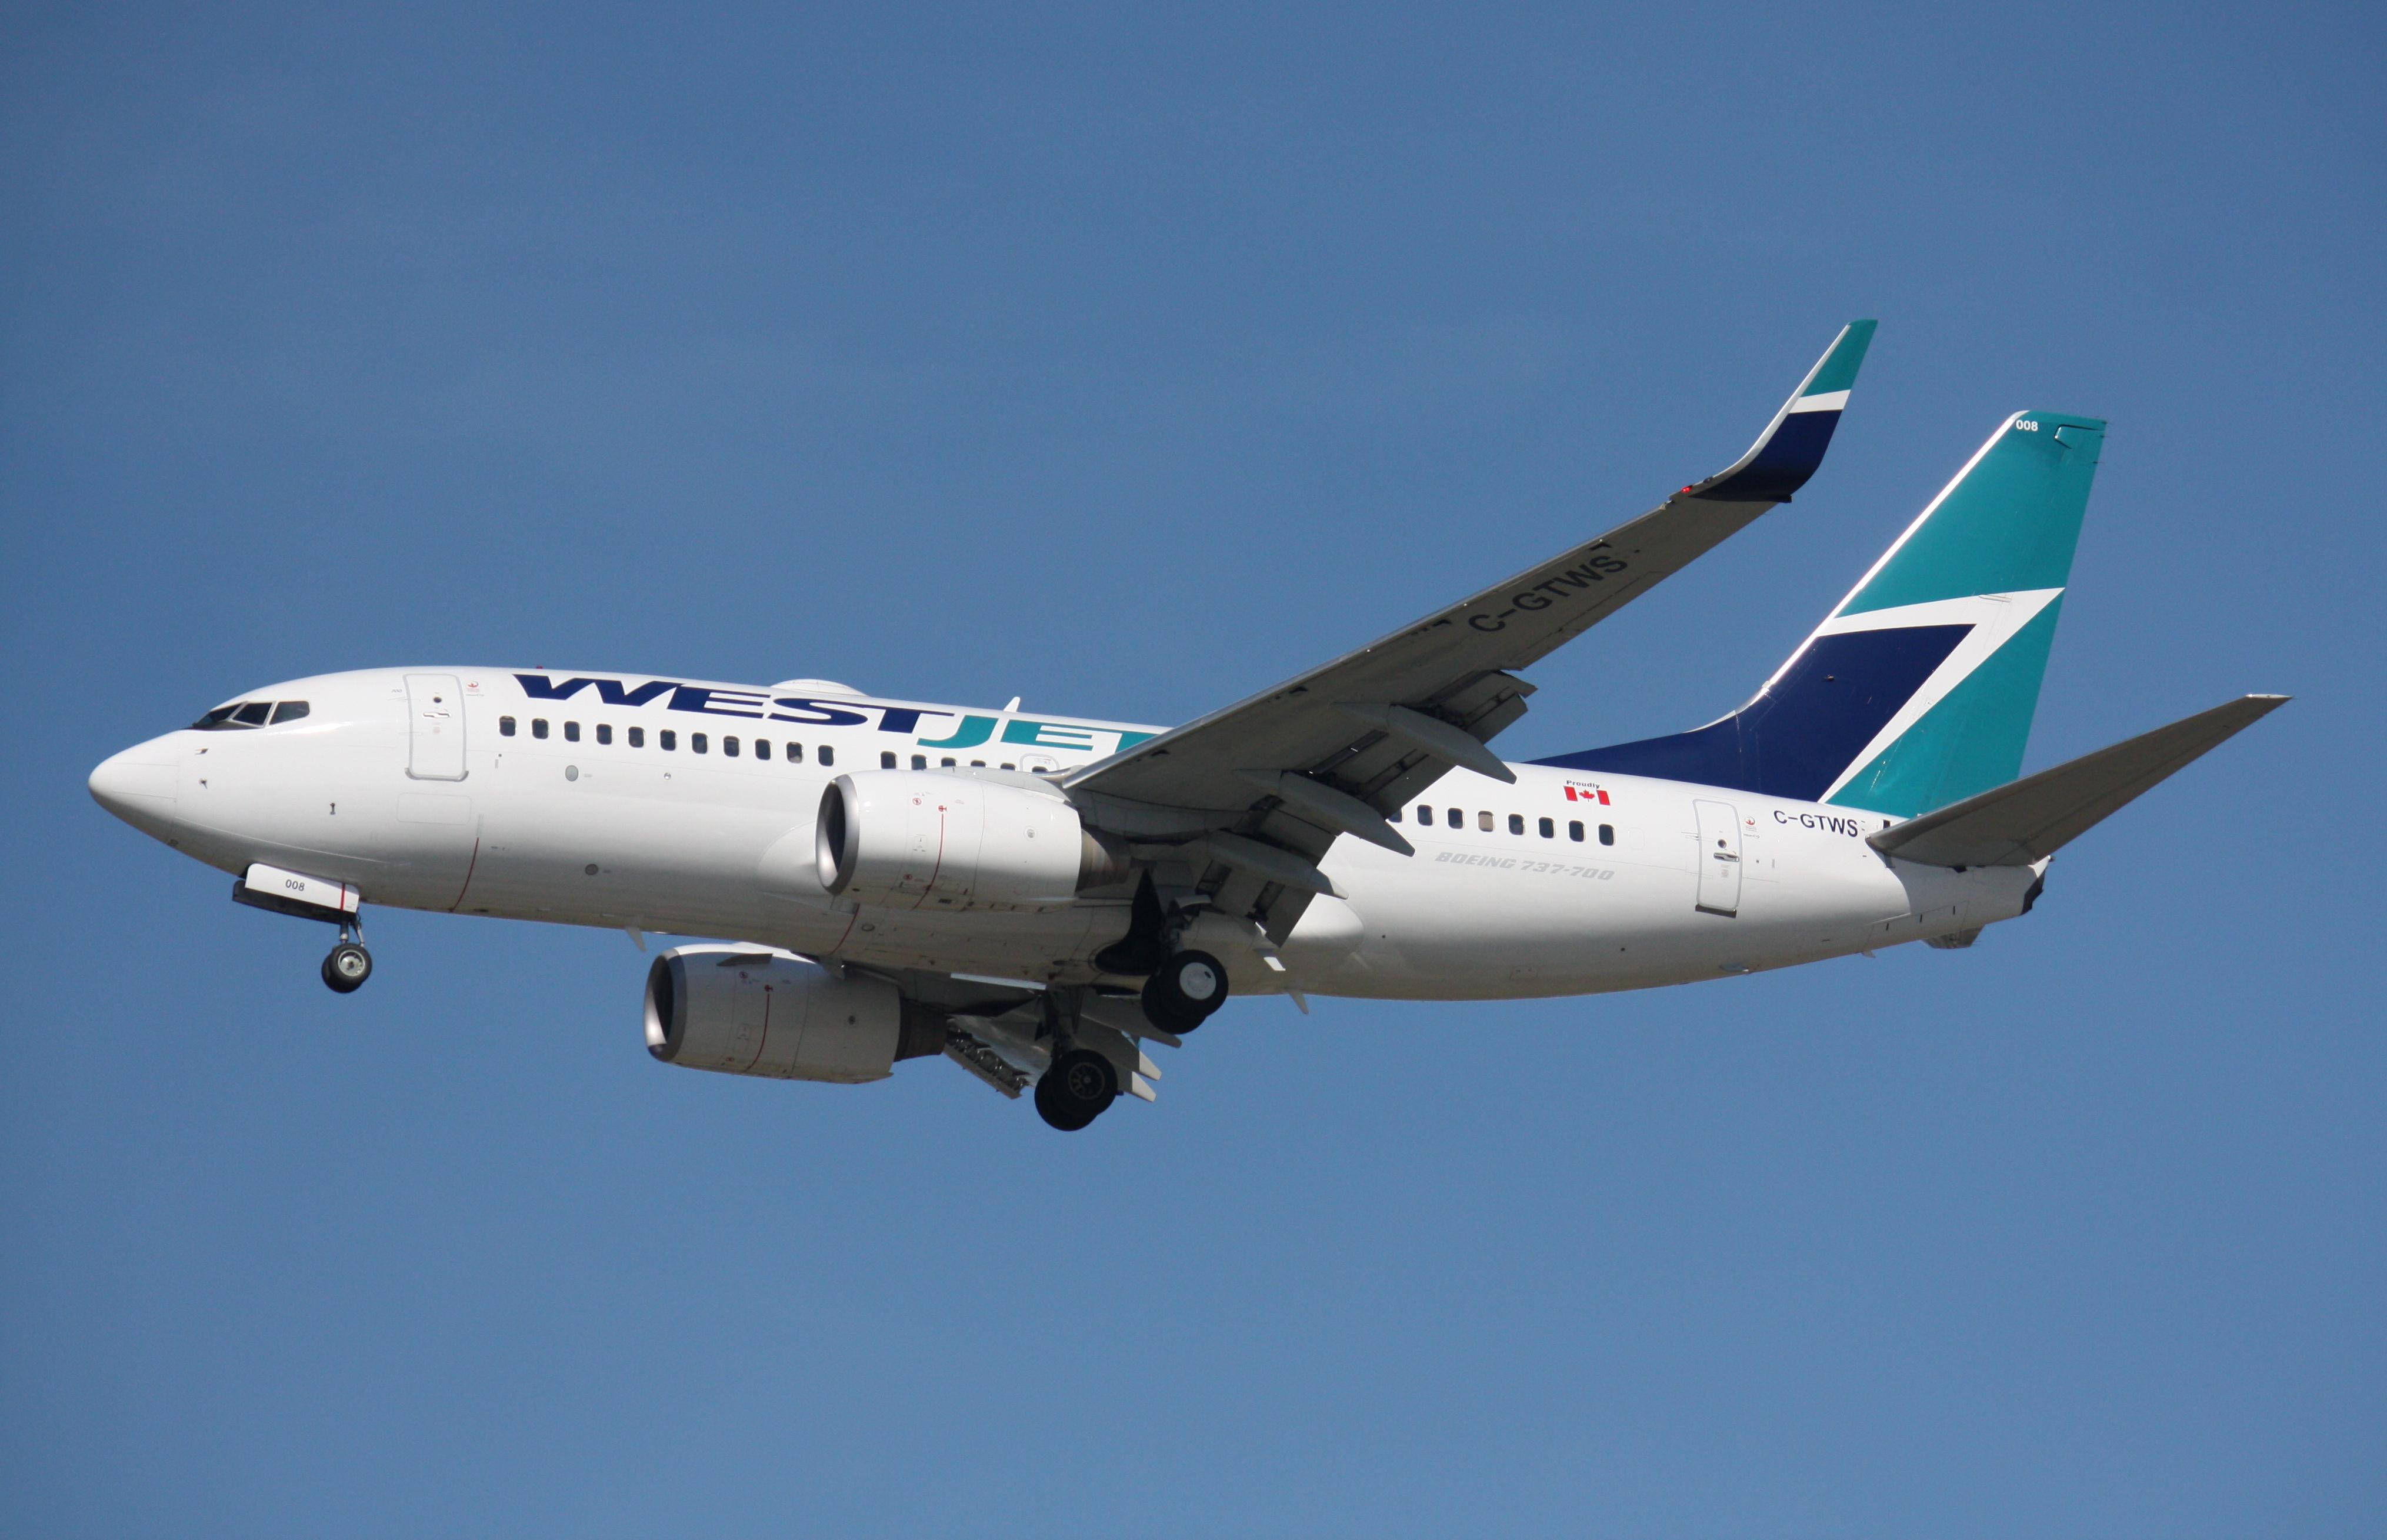 westjet how to change a flight